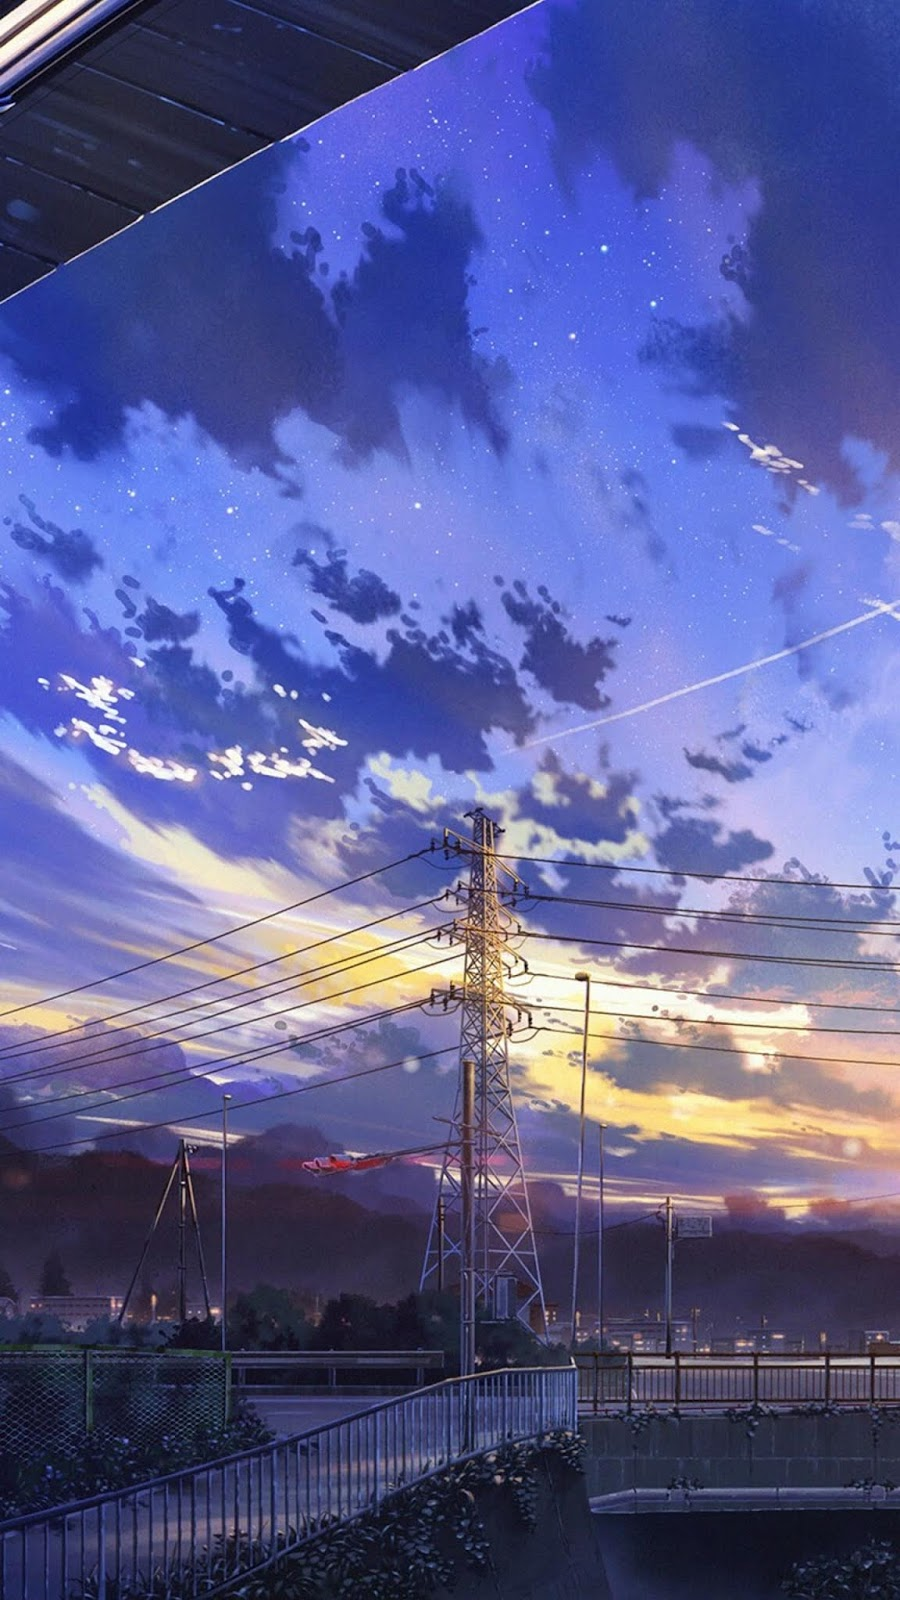 Wallpapers 4k Para Celular Anime Landscape 900x1600 Download Hd Wallpaper Wallpapertip